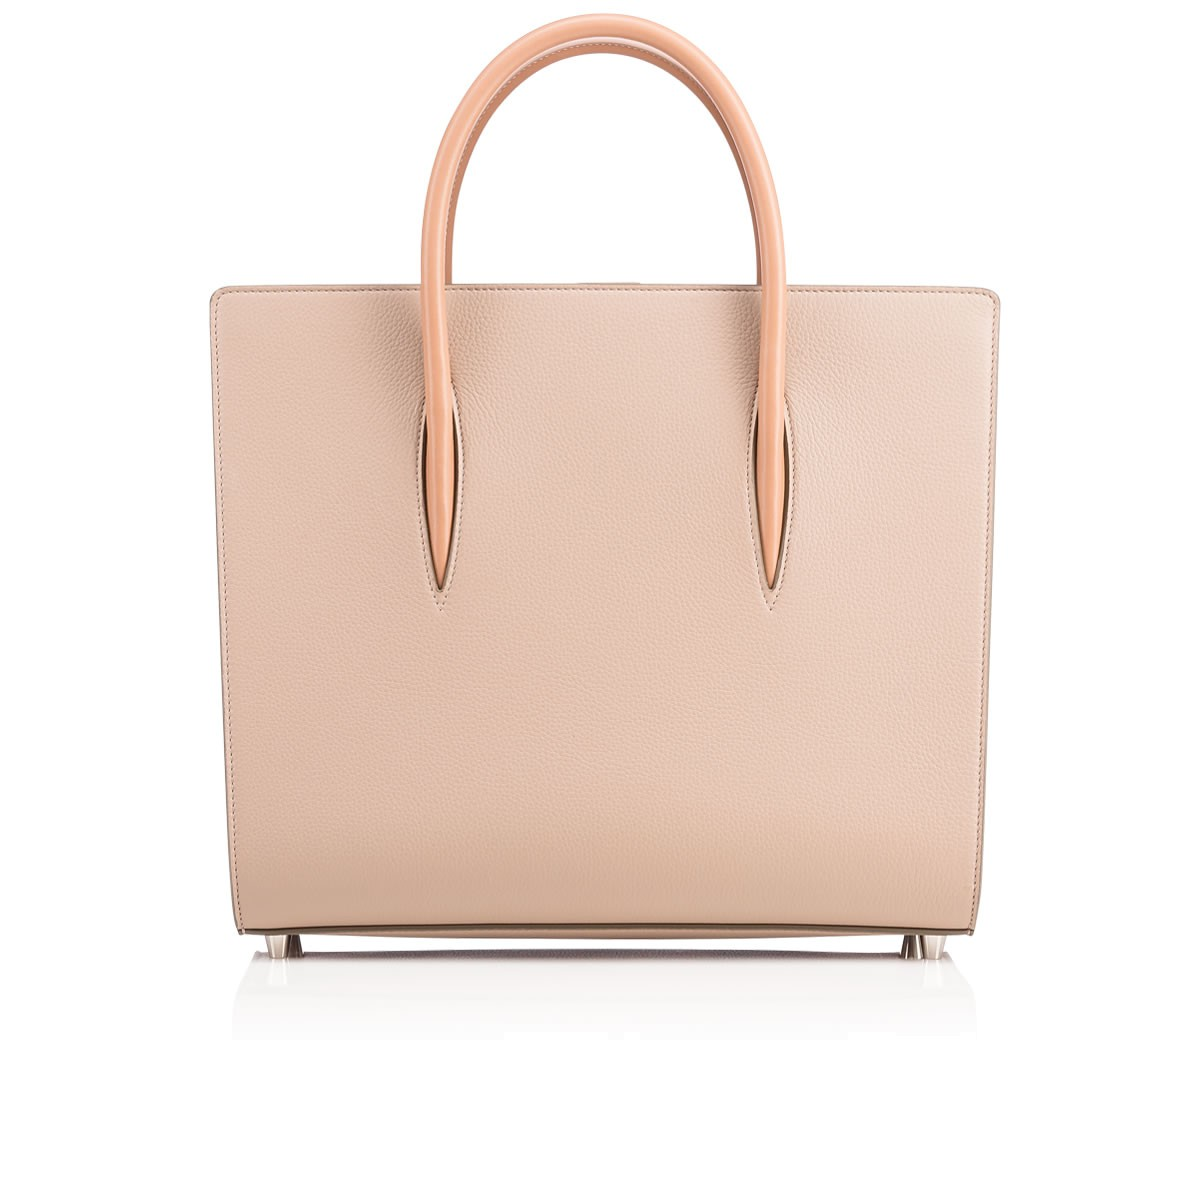 Christian Louboutin Leathers Paloma Large Tote Bag